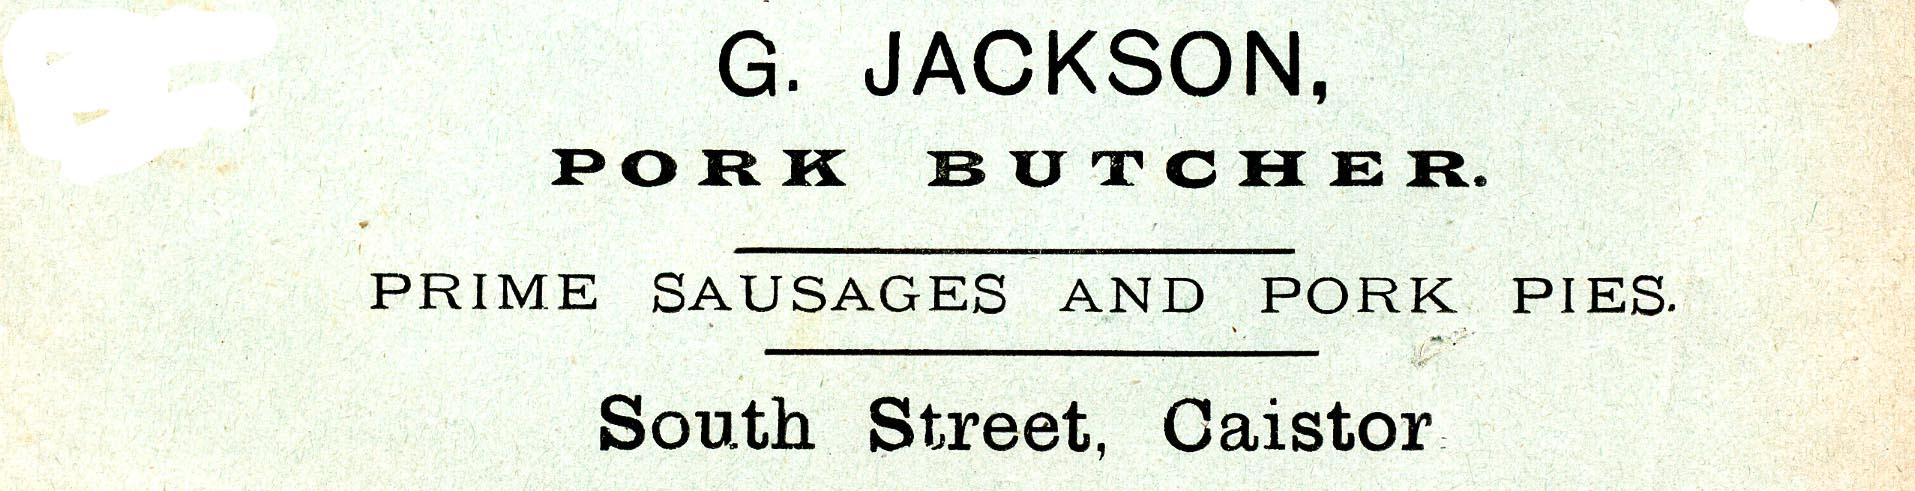 Advert 1903 G Jackson.jpg